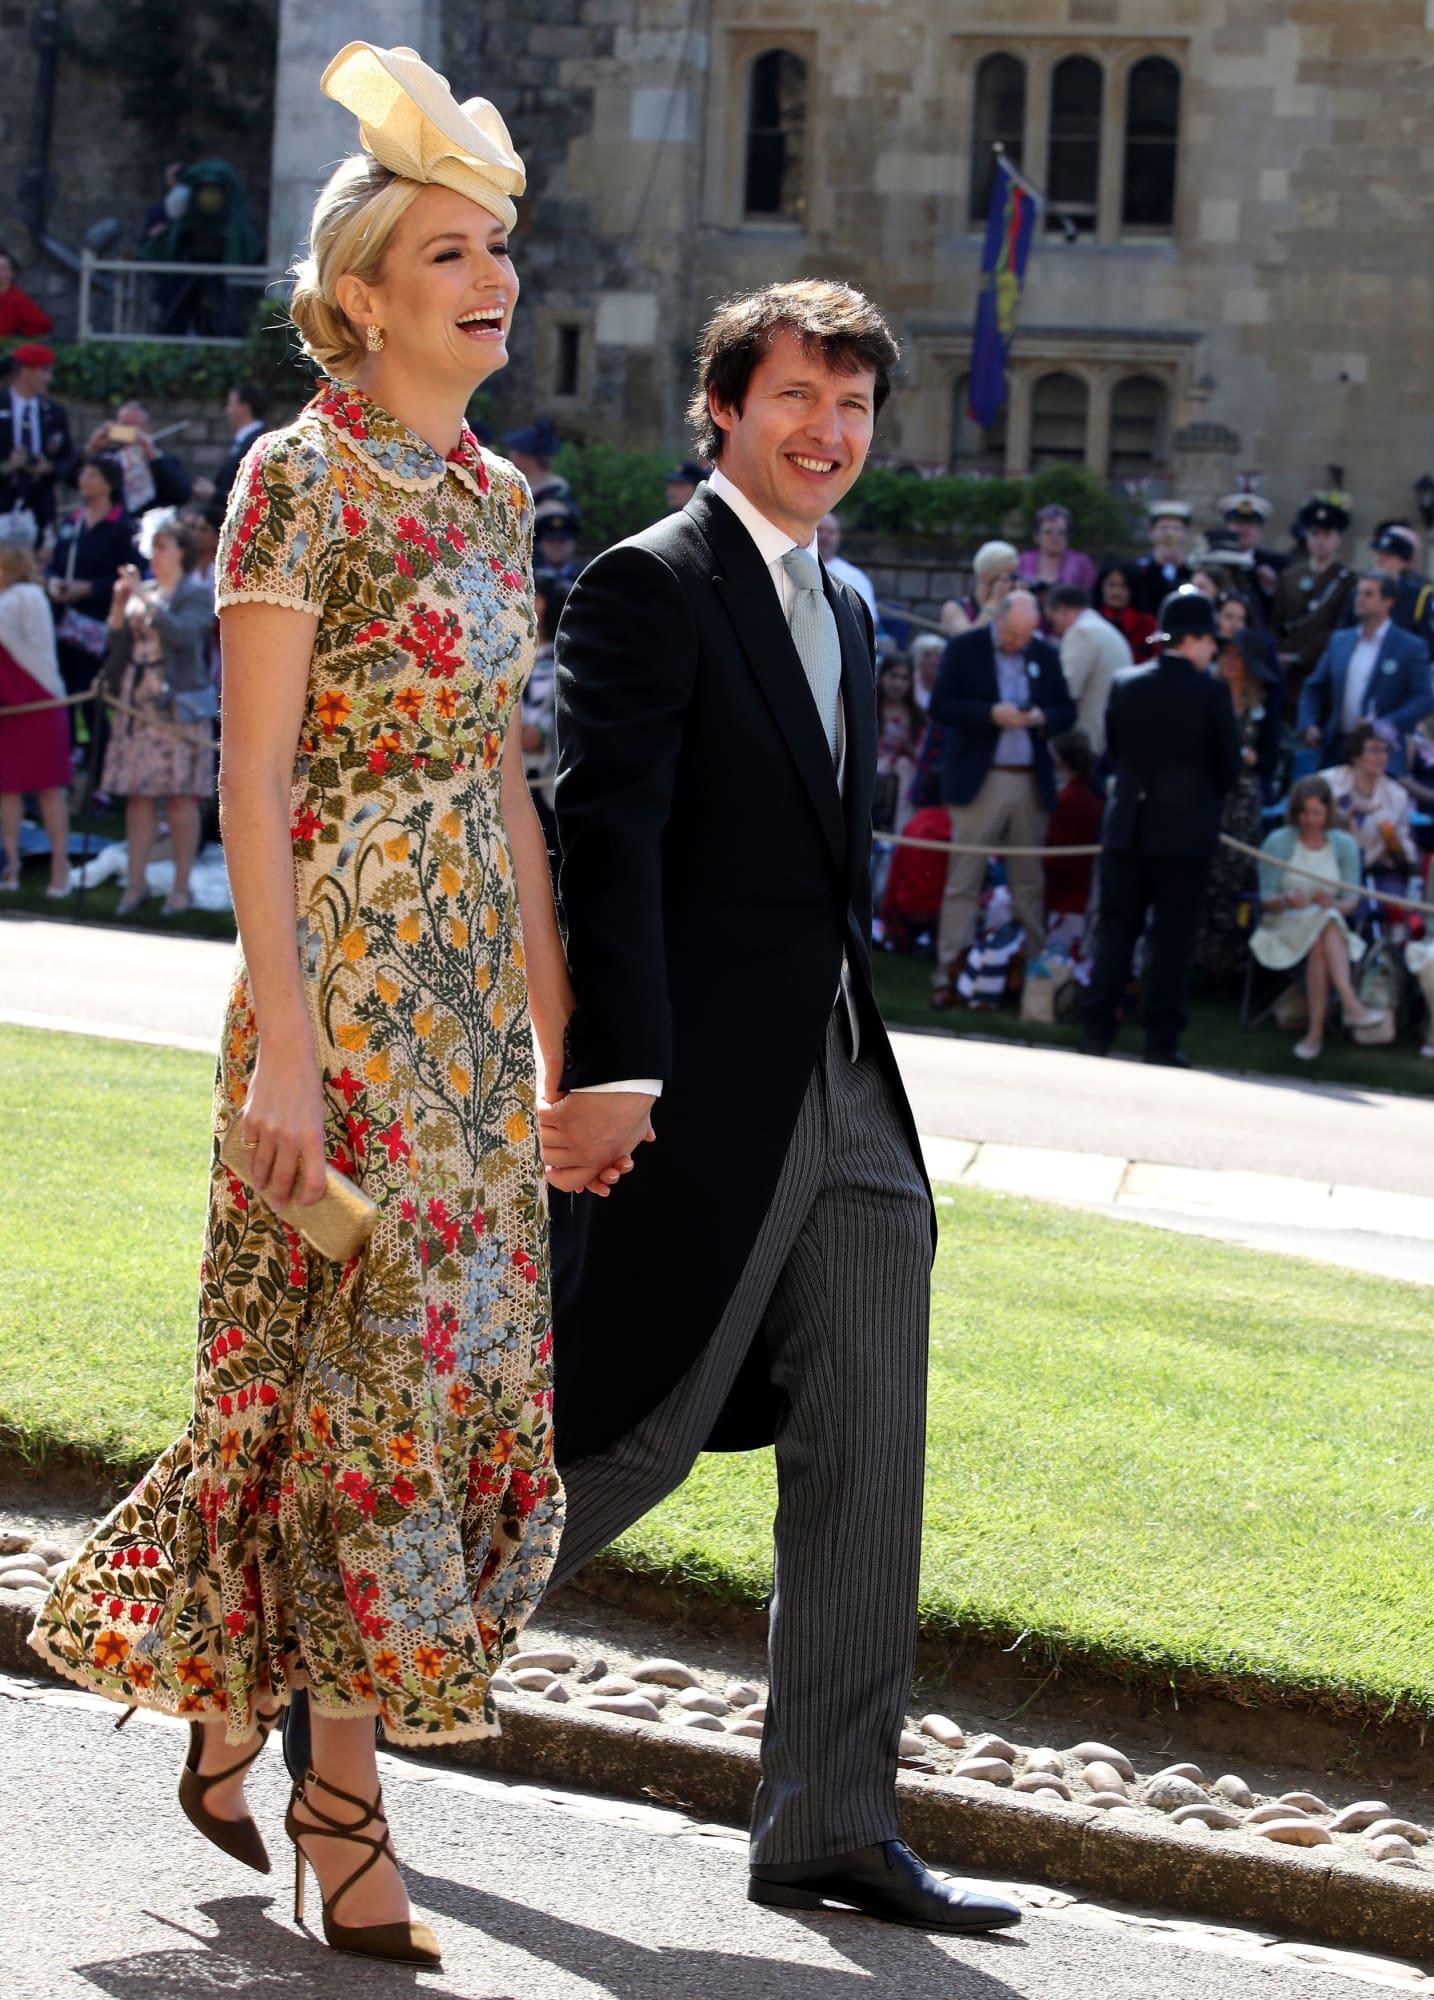 james-blunt-royal-wedding.jpg